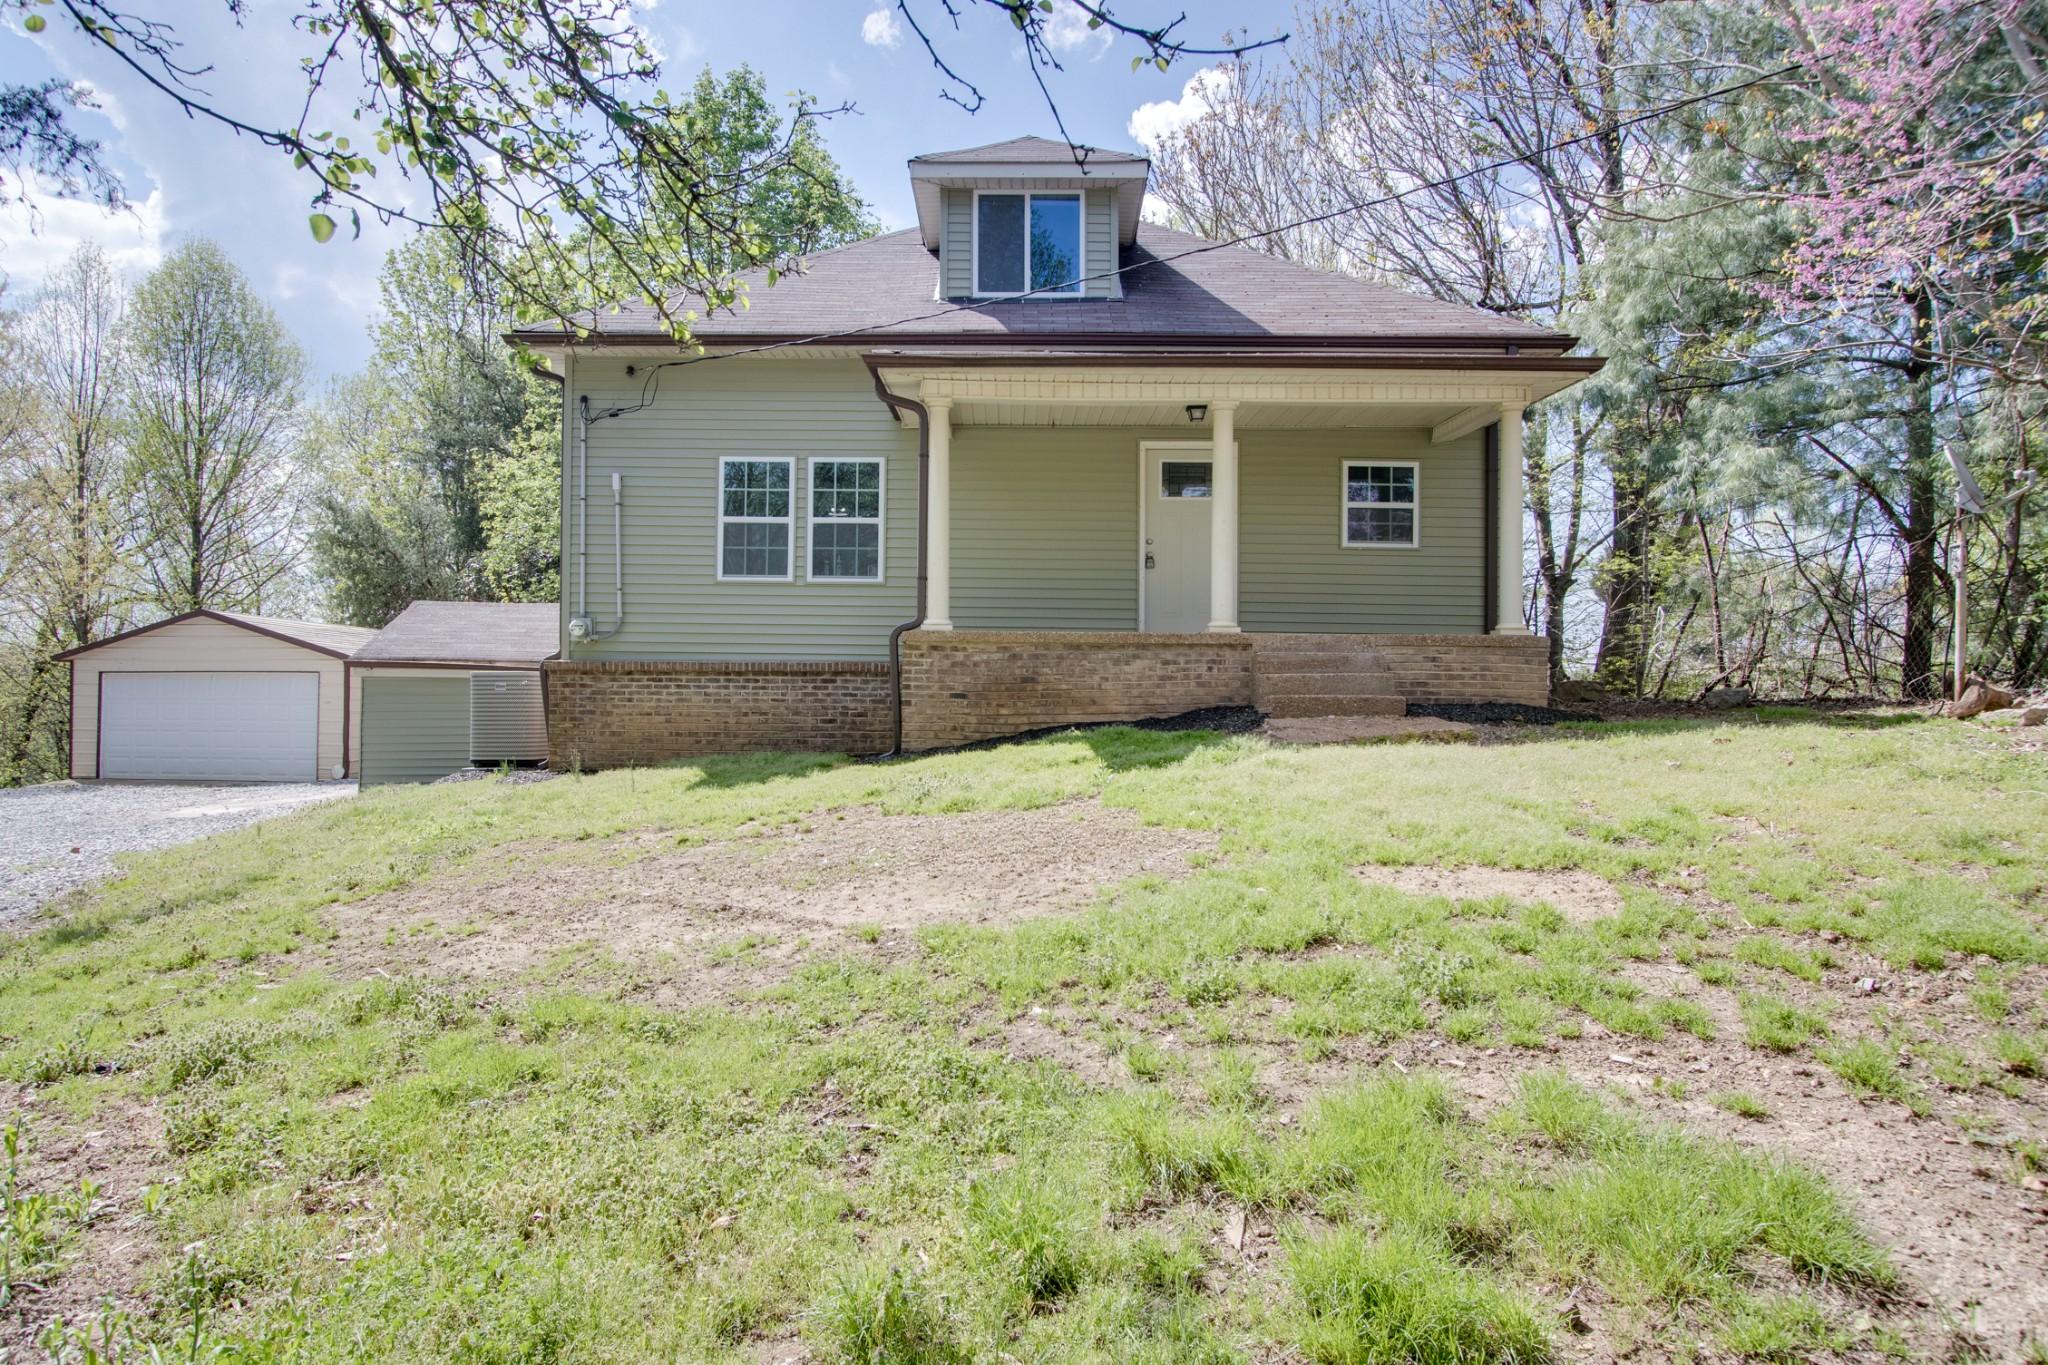 862 Cookeville Hwy, Elmwood, TN 38560 - Elmwood, TN real estate listing